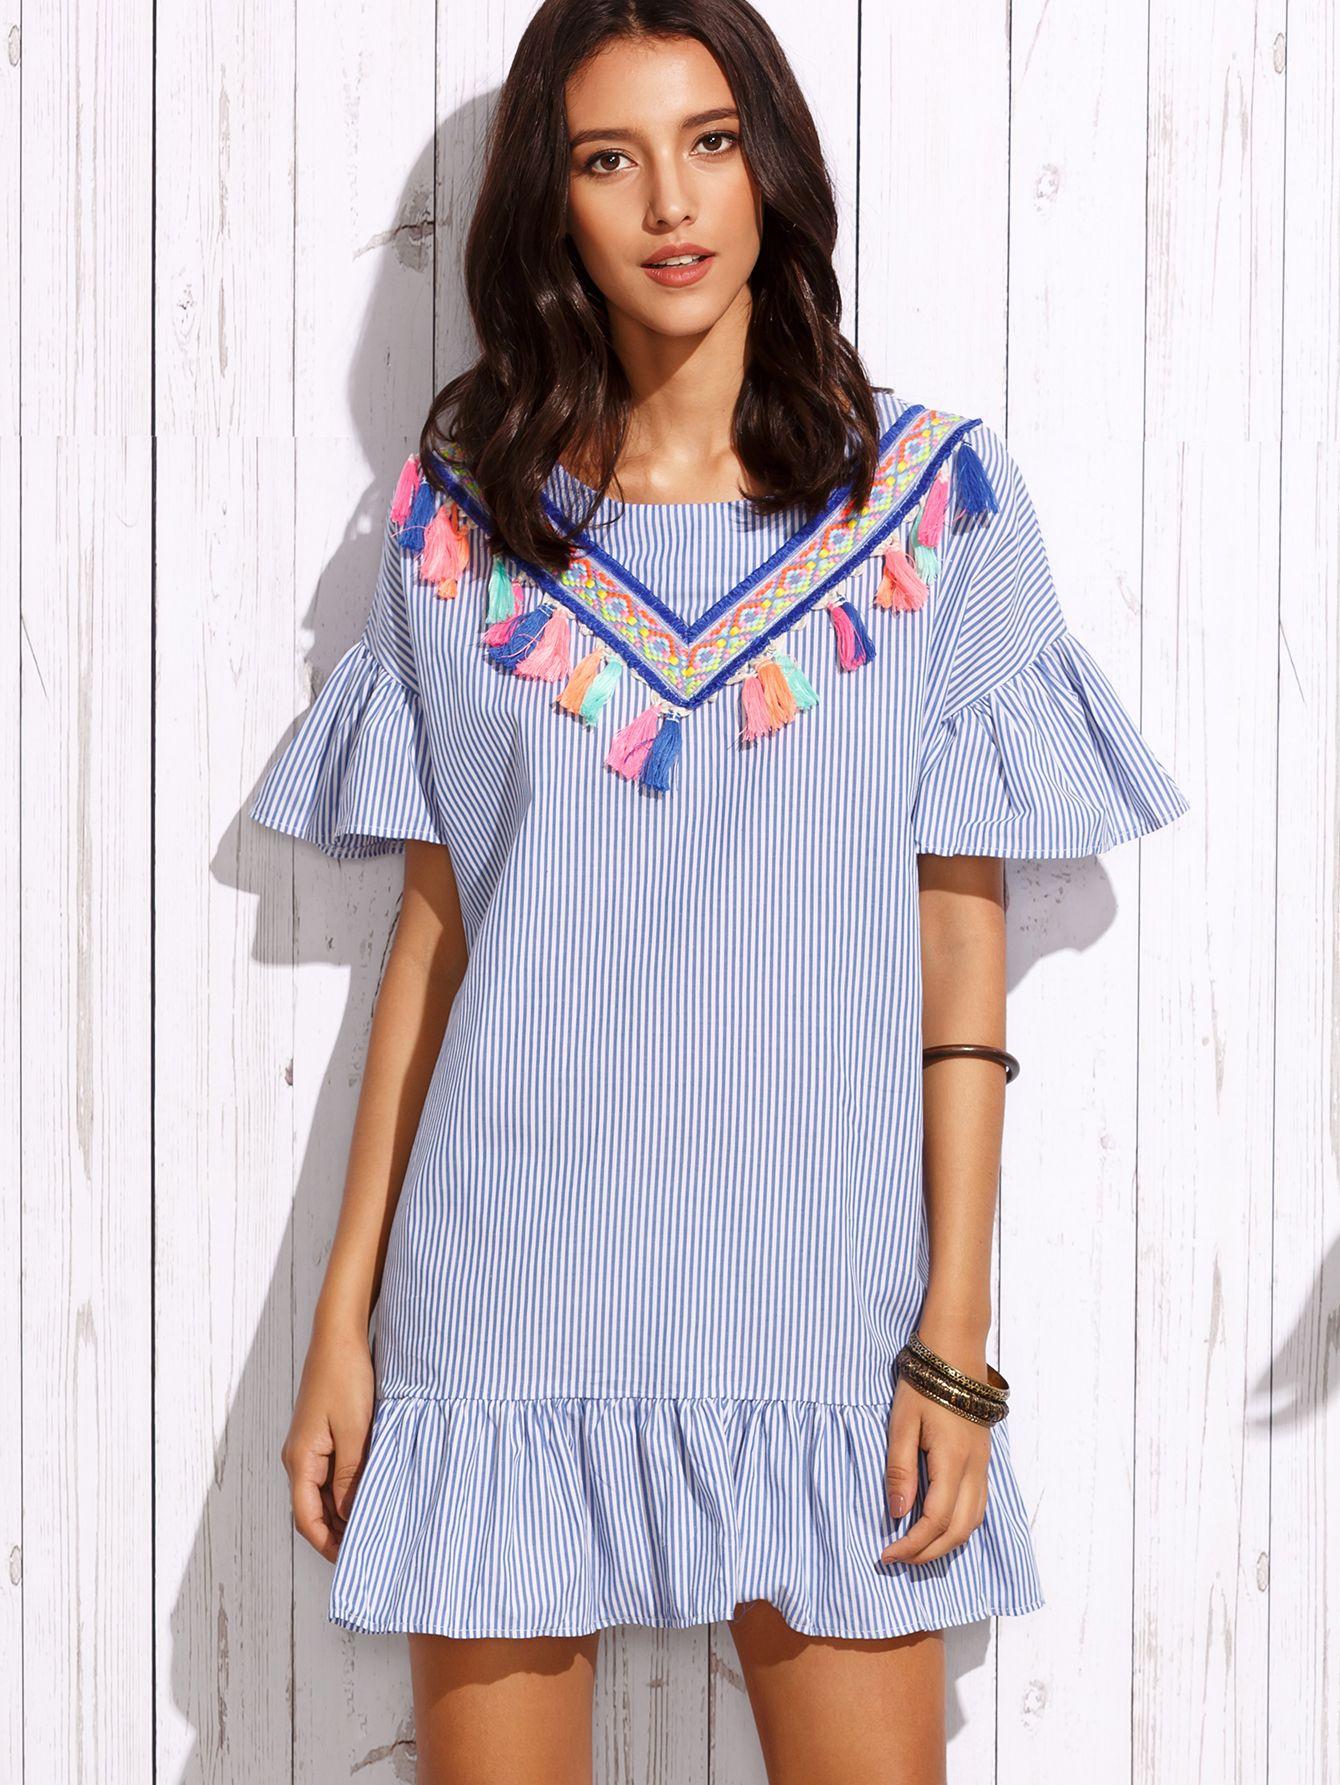 619c576c3 Vestido rayas verticales volantes con detalle de cinta bordada - azul-Spanish  SheIn(Sheinside)